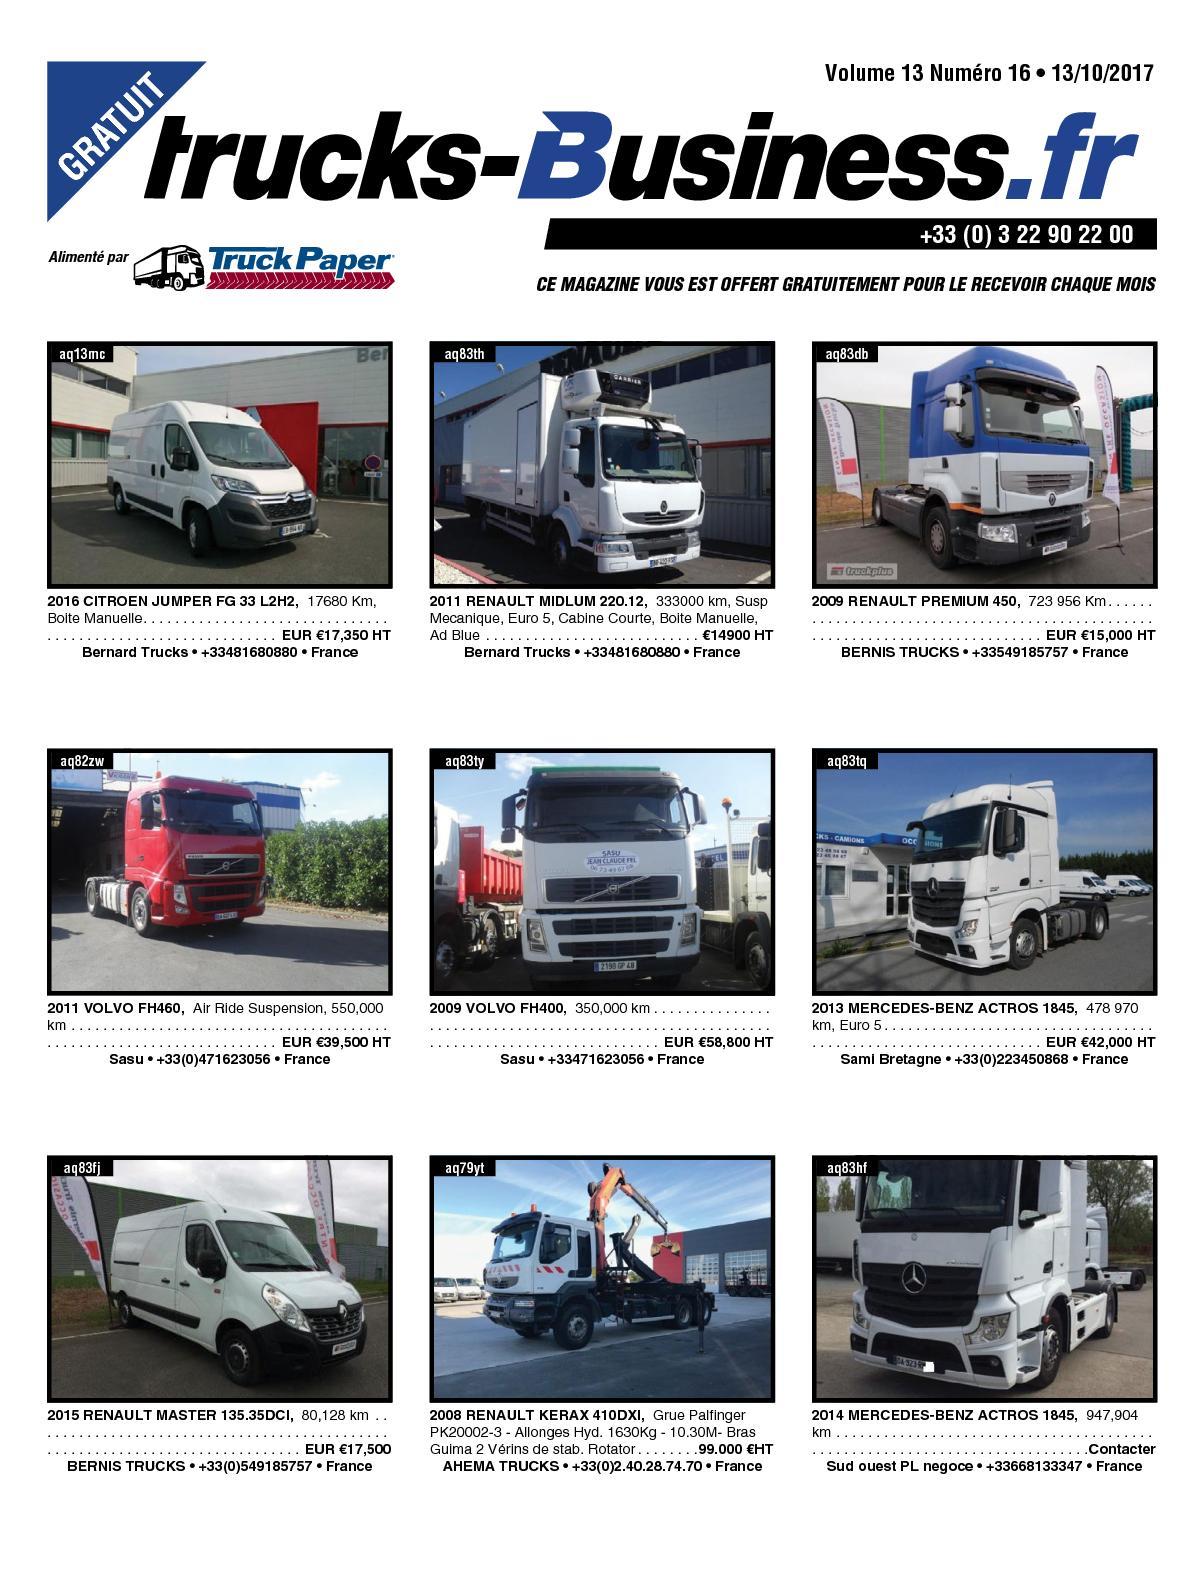 Finest Affordable Poco Transporter Mieten Preis With Splschrnke Gnstig Preise